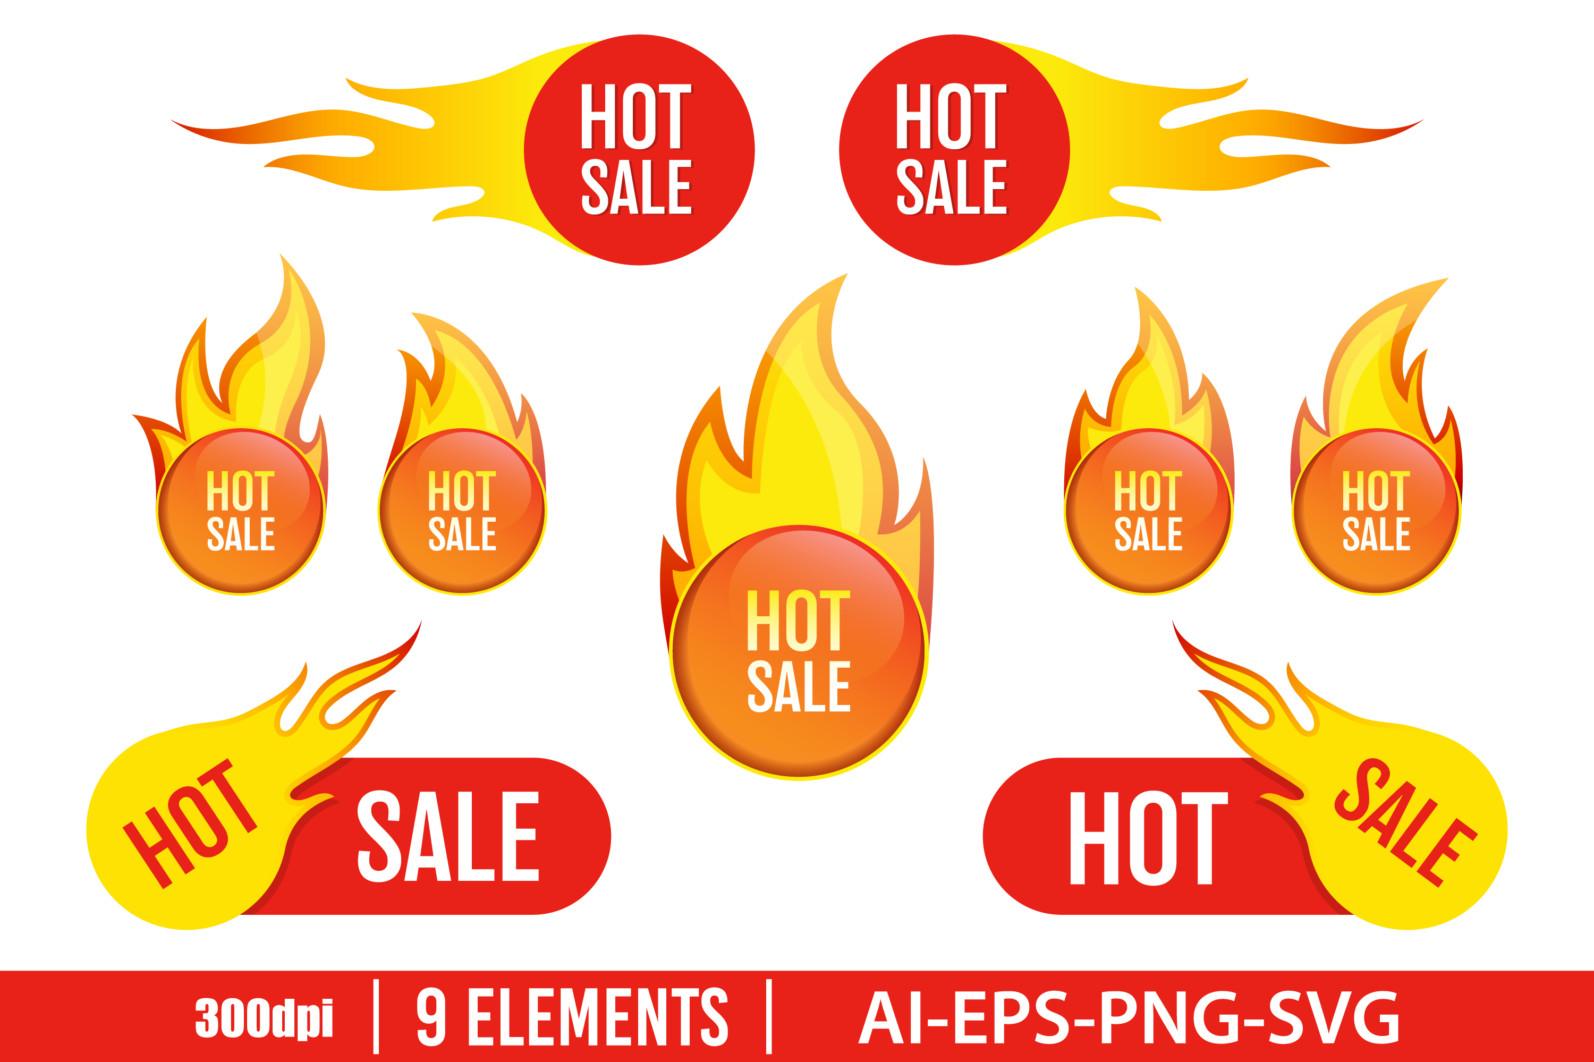 Hot sale emblem clipart vector design illustration. Hot sale emblem set. Vector Clipart Print - HOT SALE scaled -